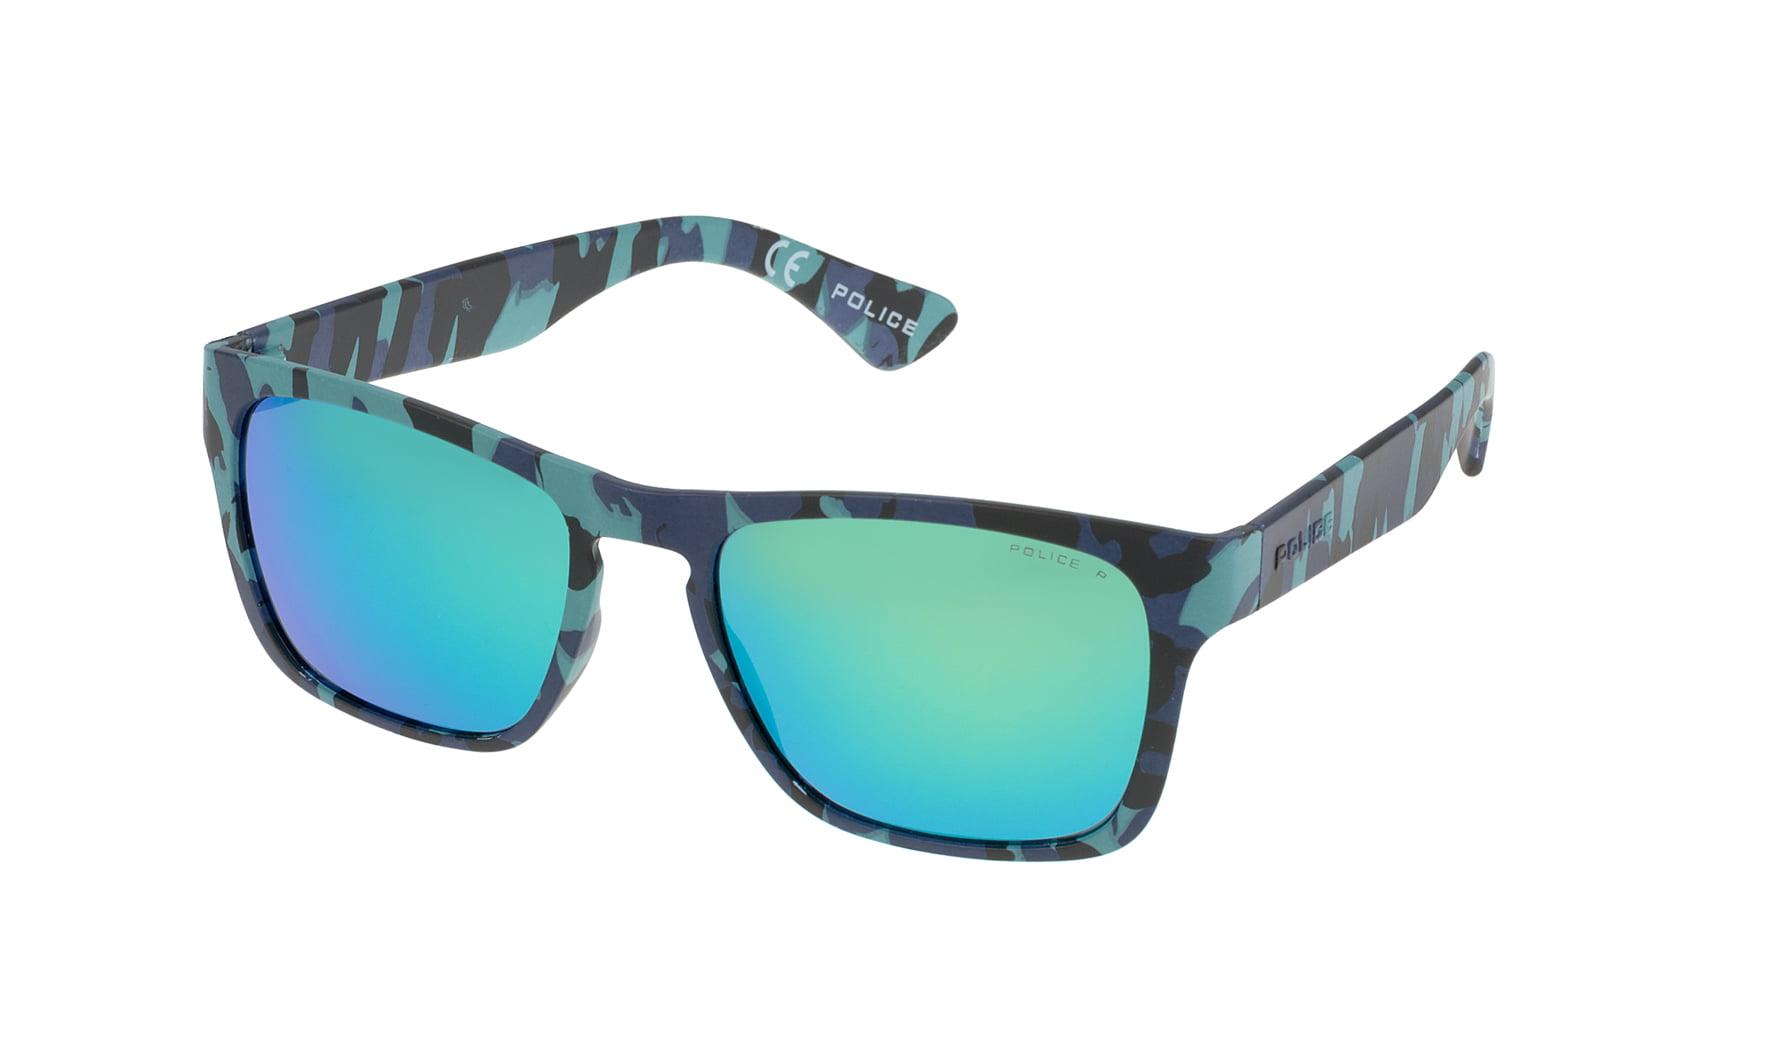 Police Sunglasses Glasses Eyewear Polarized Driving Fashion Outdoor Men/'s P758